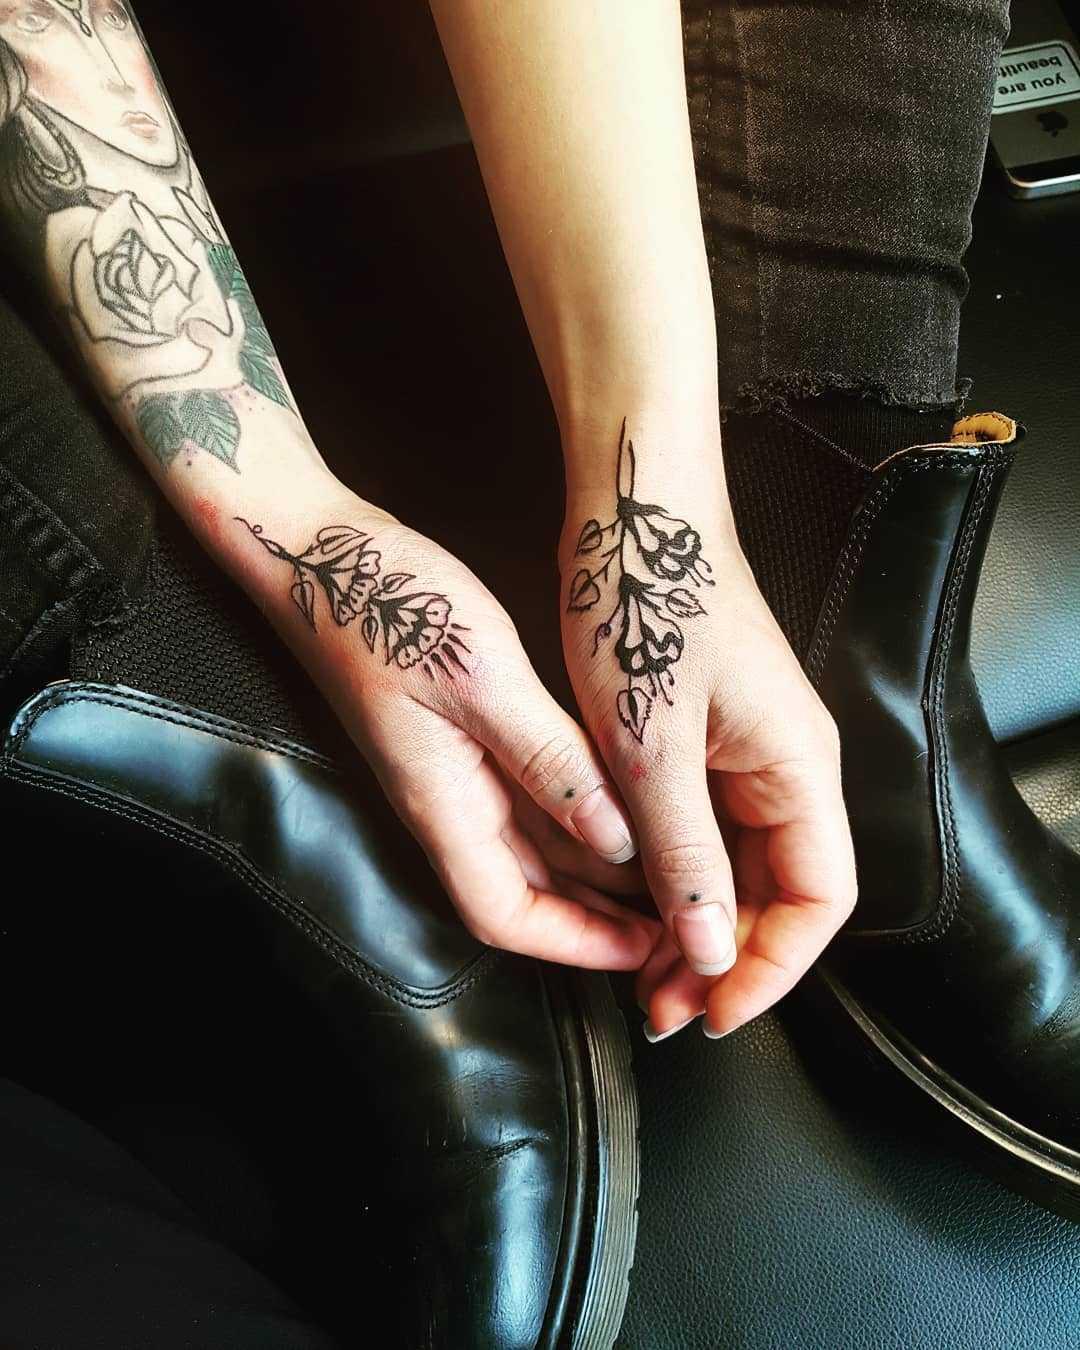 Beautiful black flowers on both hands